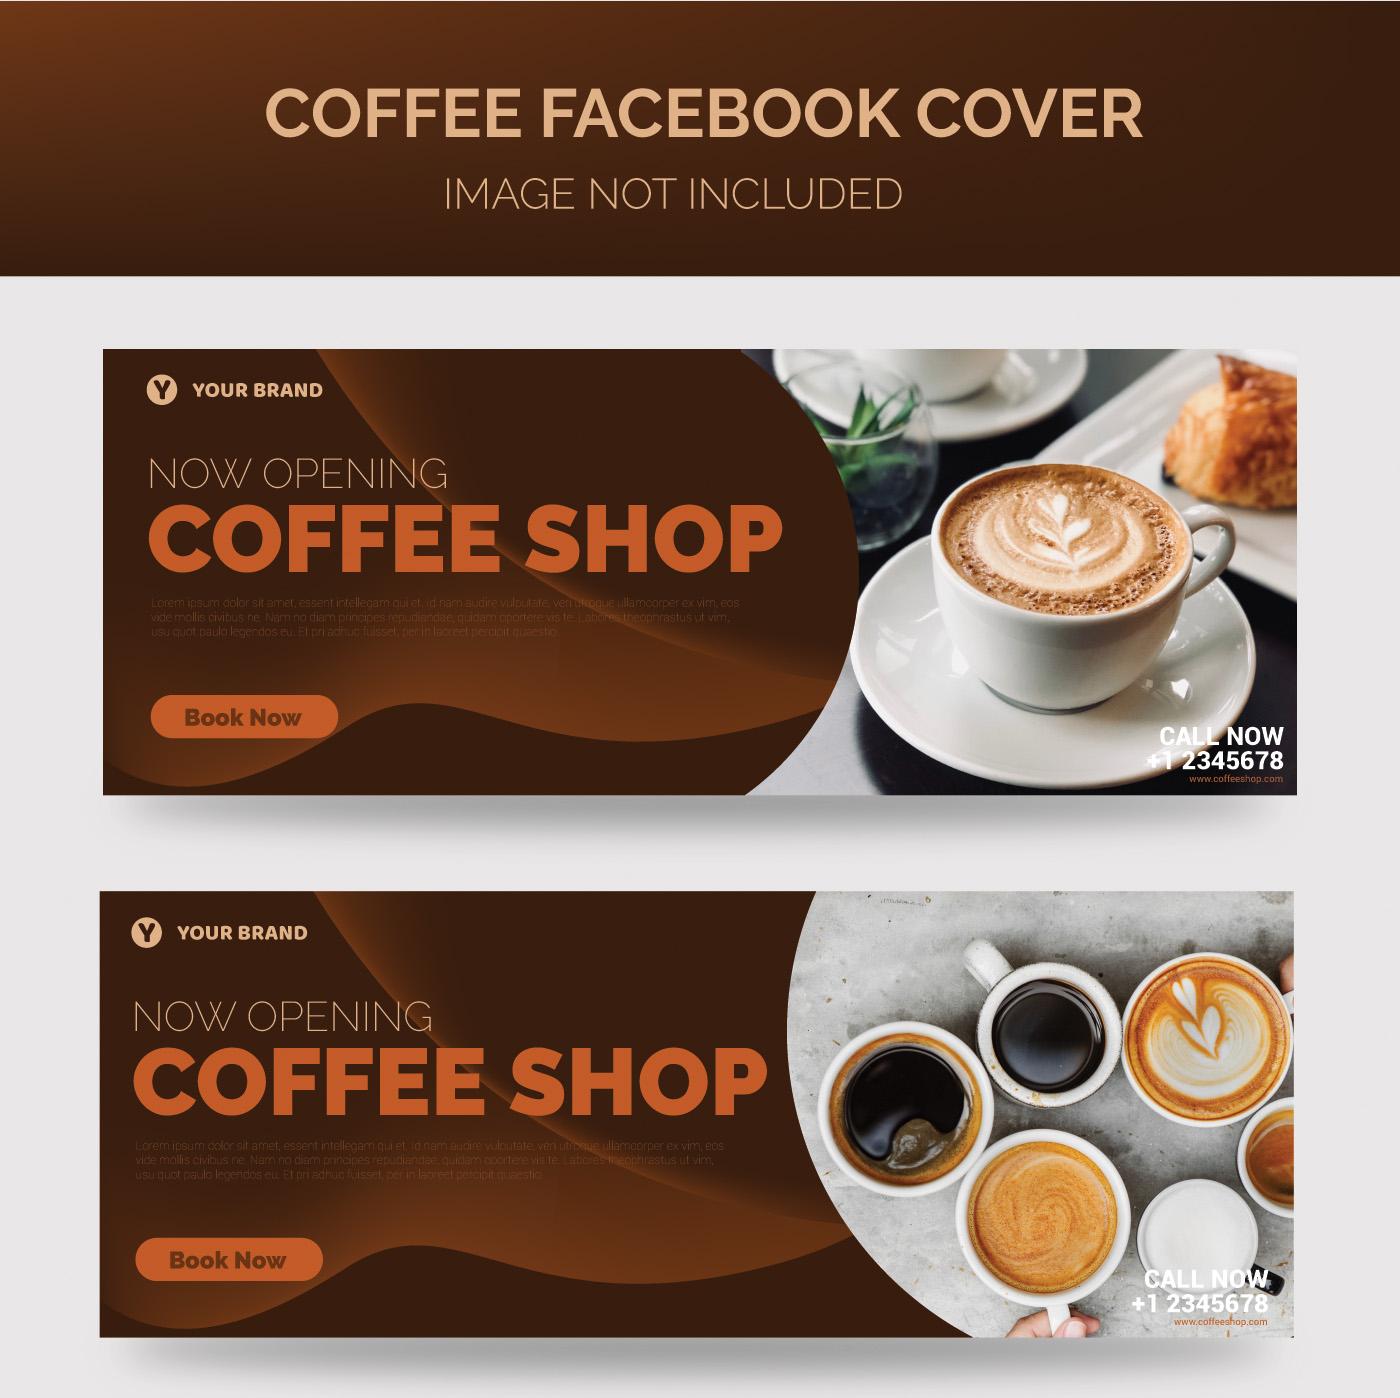 Banner De Cafe Download Vetores Gratis Desenhos De Vetor Modelos E Clipart